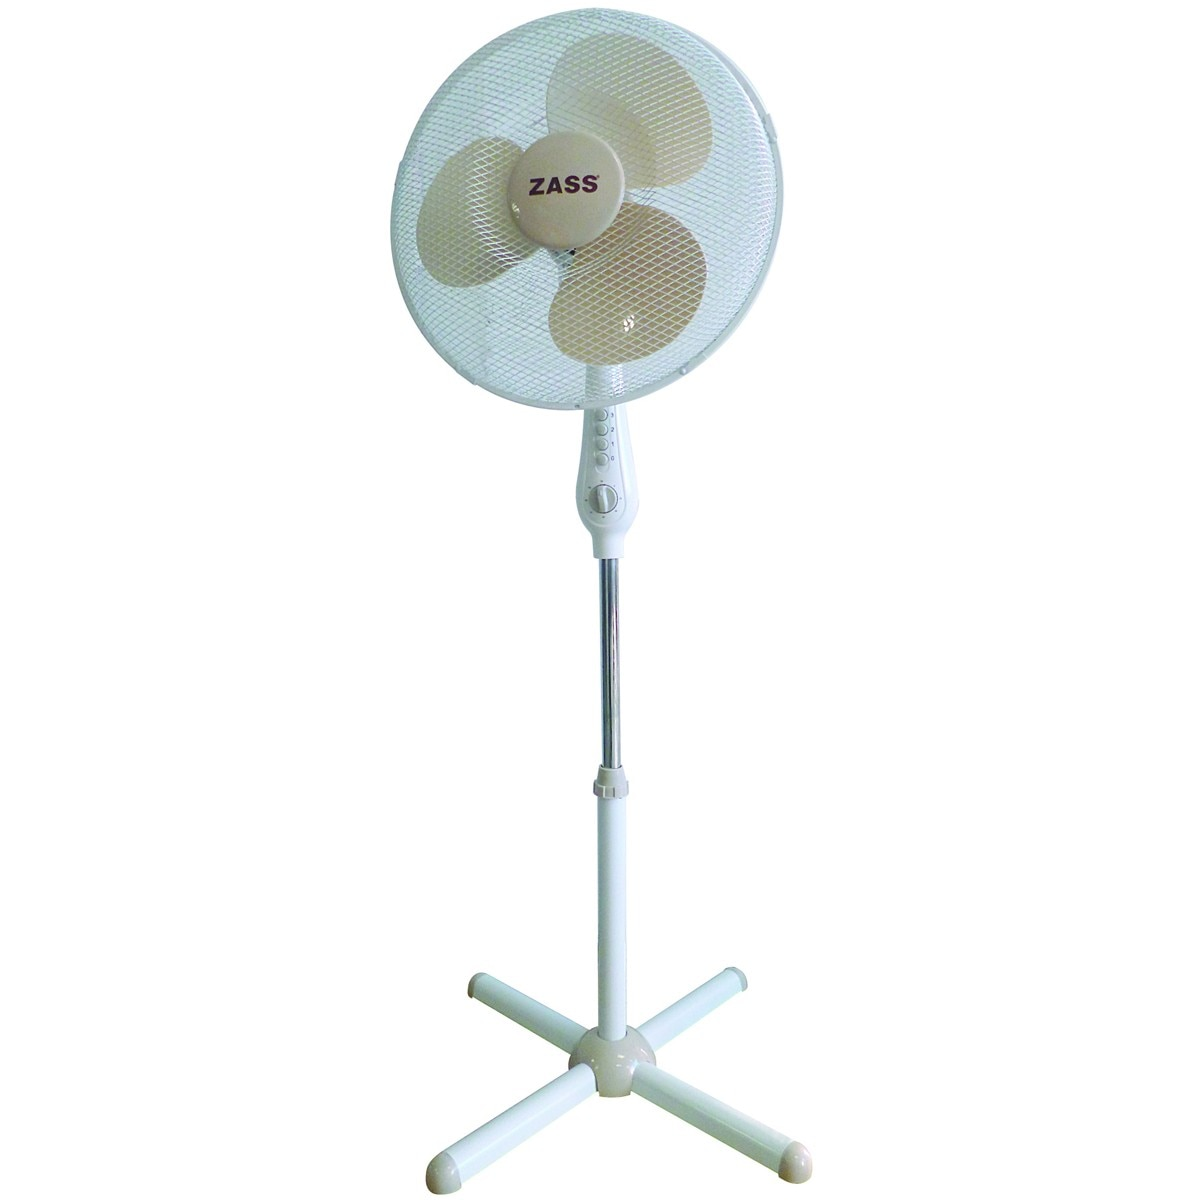 Fotografie Ventilator cu picior Zass ZFT 1602, 50W, 3 viteze, timer, 41cm diametru, Alb